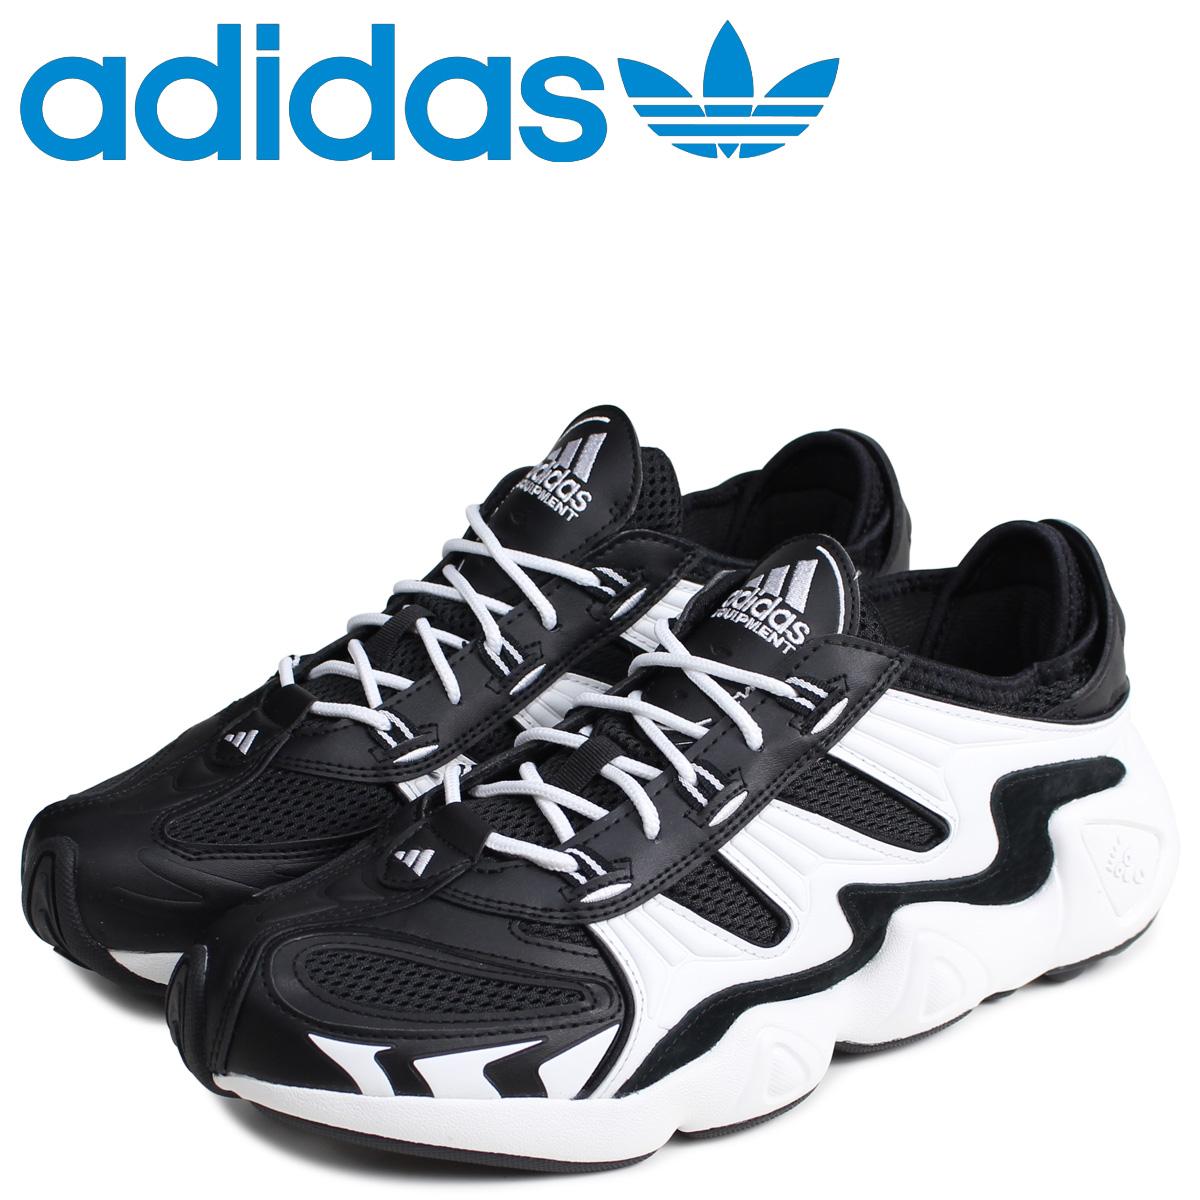 adidas Originals アディダス オリジナルス FYW S-97 スニーカー メンズ ブラック 黒 G27986